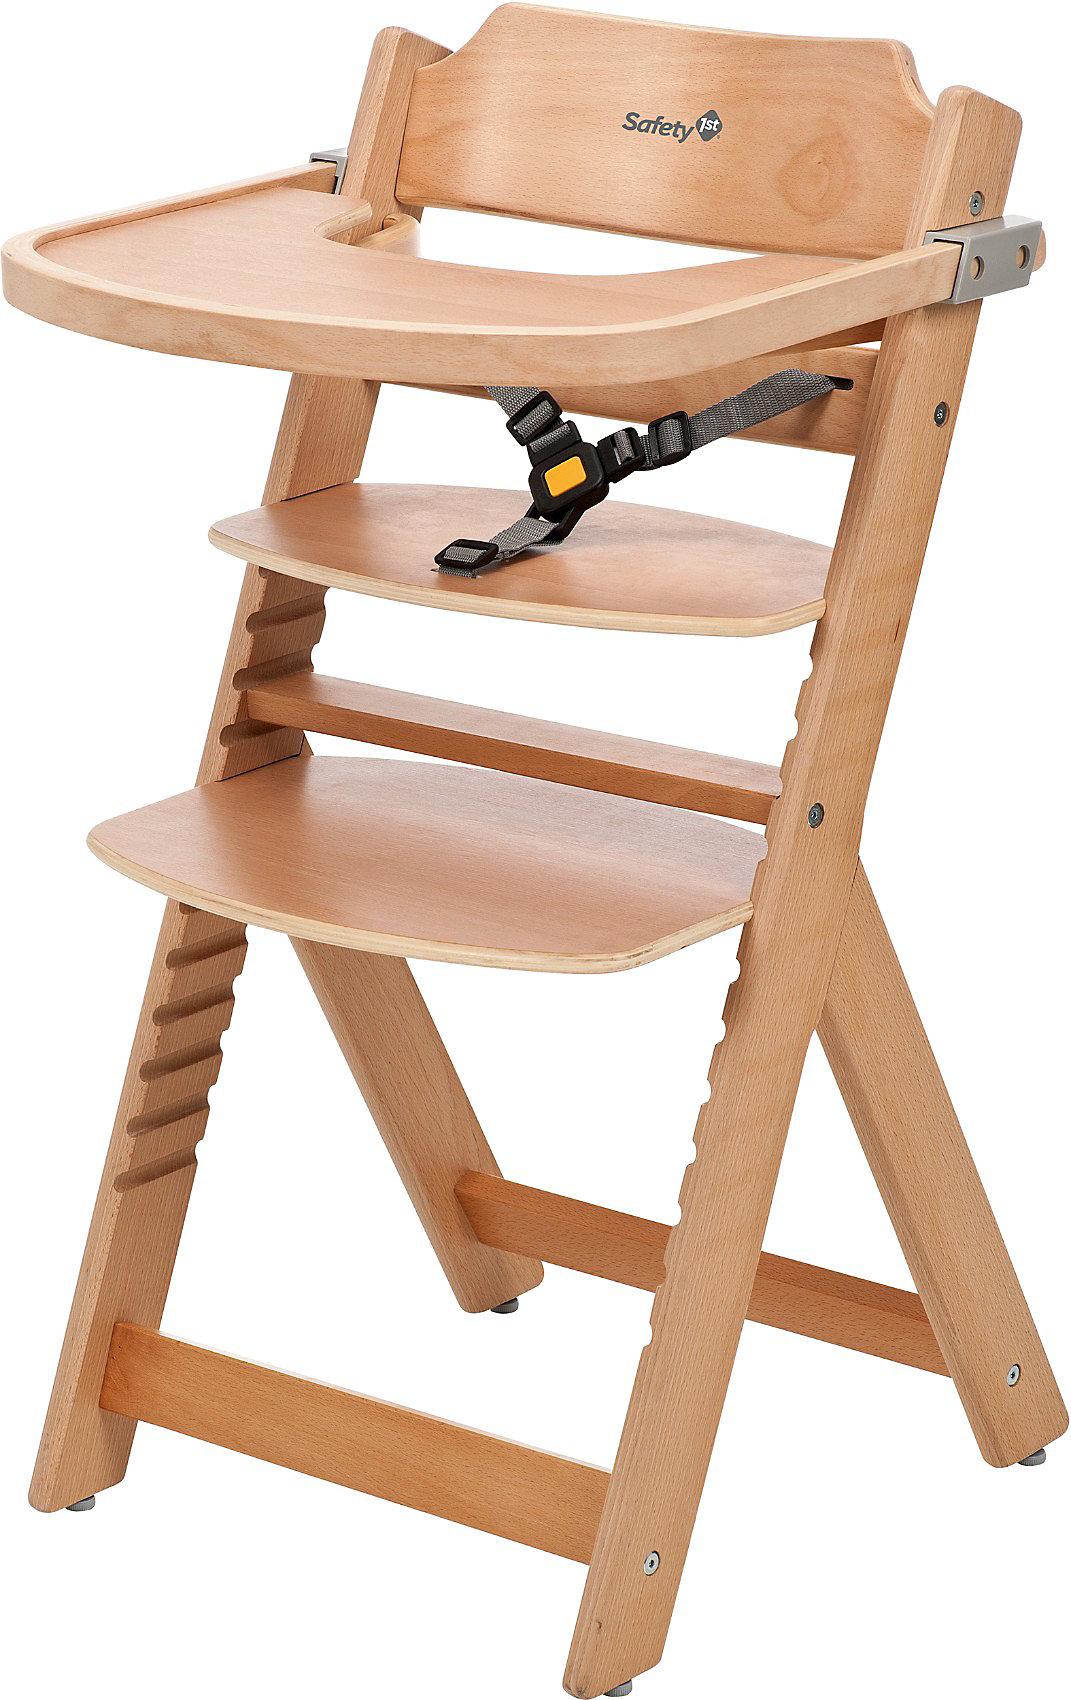 natural wood 6068924 braun weiß grau Neu Safety 1st Hochstuhl Timba